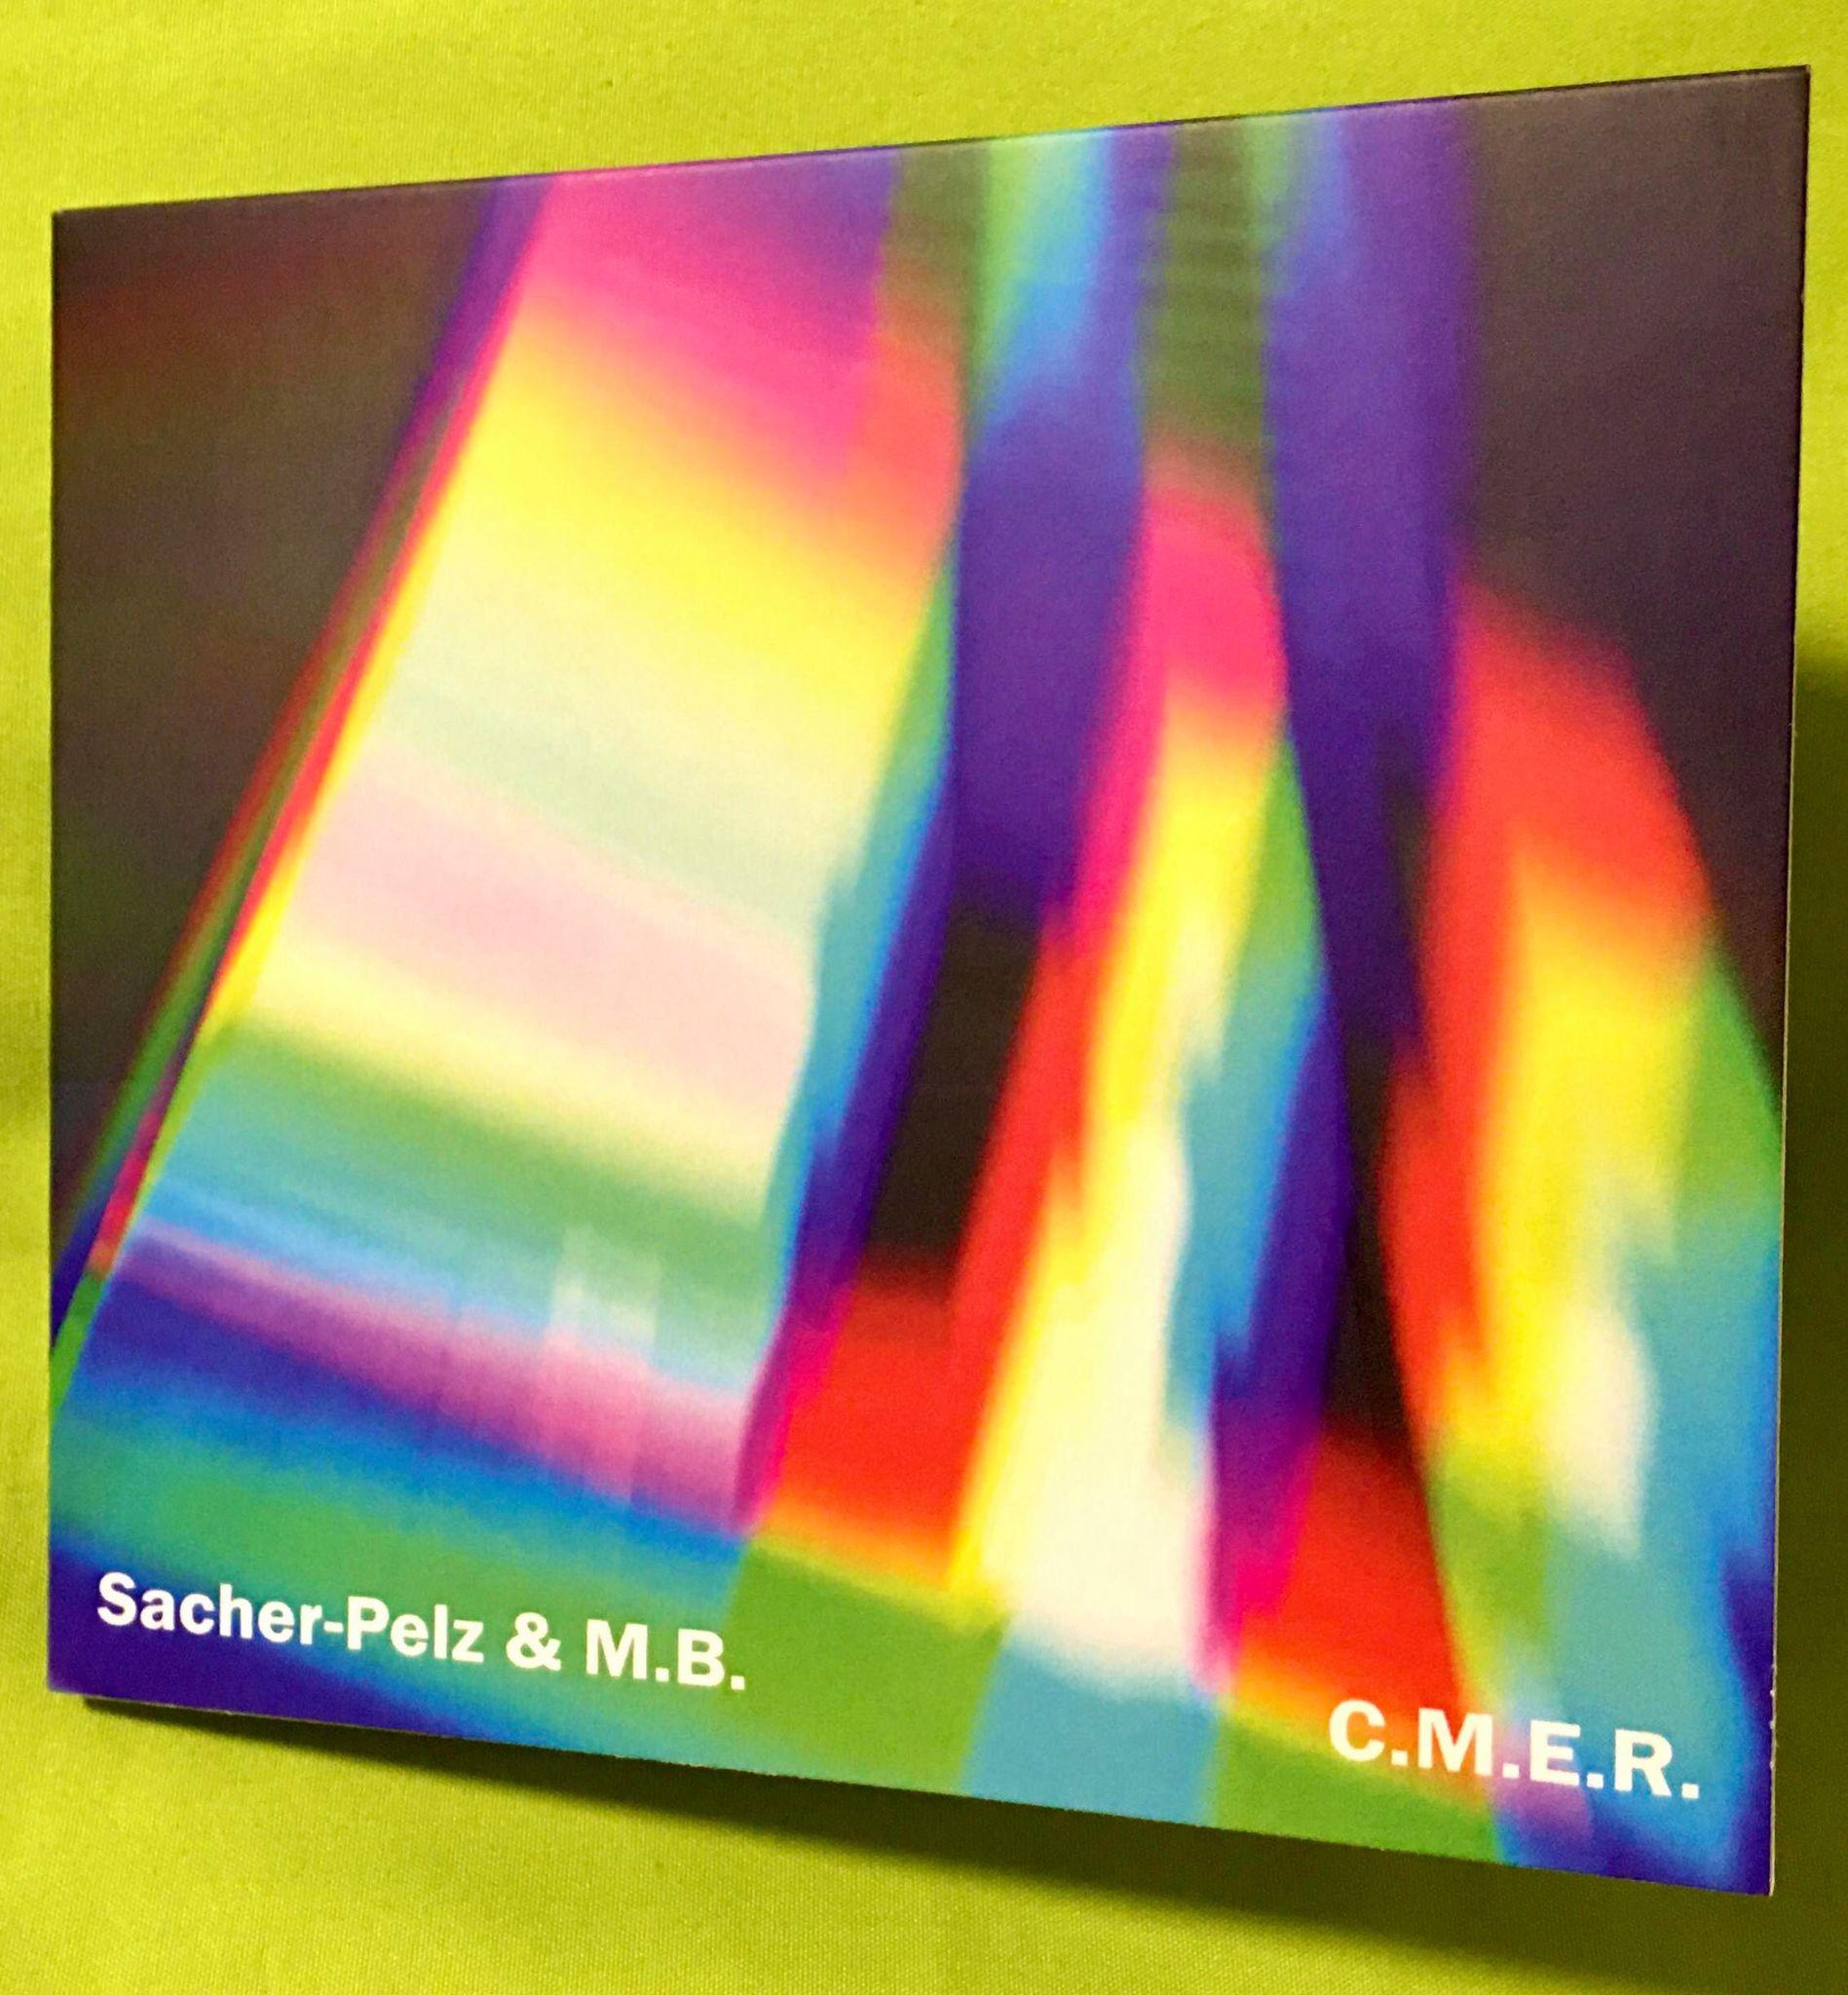 Sacher-Pelz & MB Maurizio Bianchi - CMER CD 1